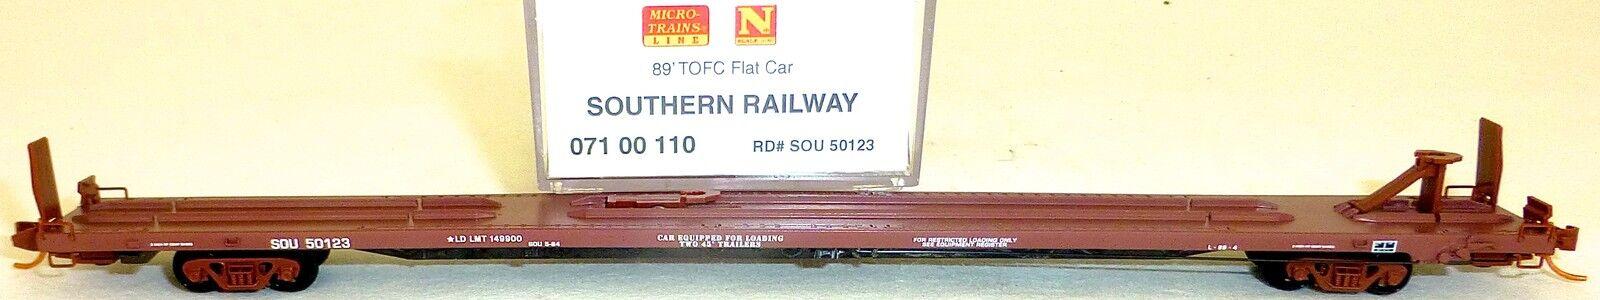 89 Tofc Piatto Car Southern Ferrovia Sou 50123 Microtrains 07100110 1:160  HS5 Å